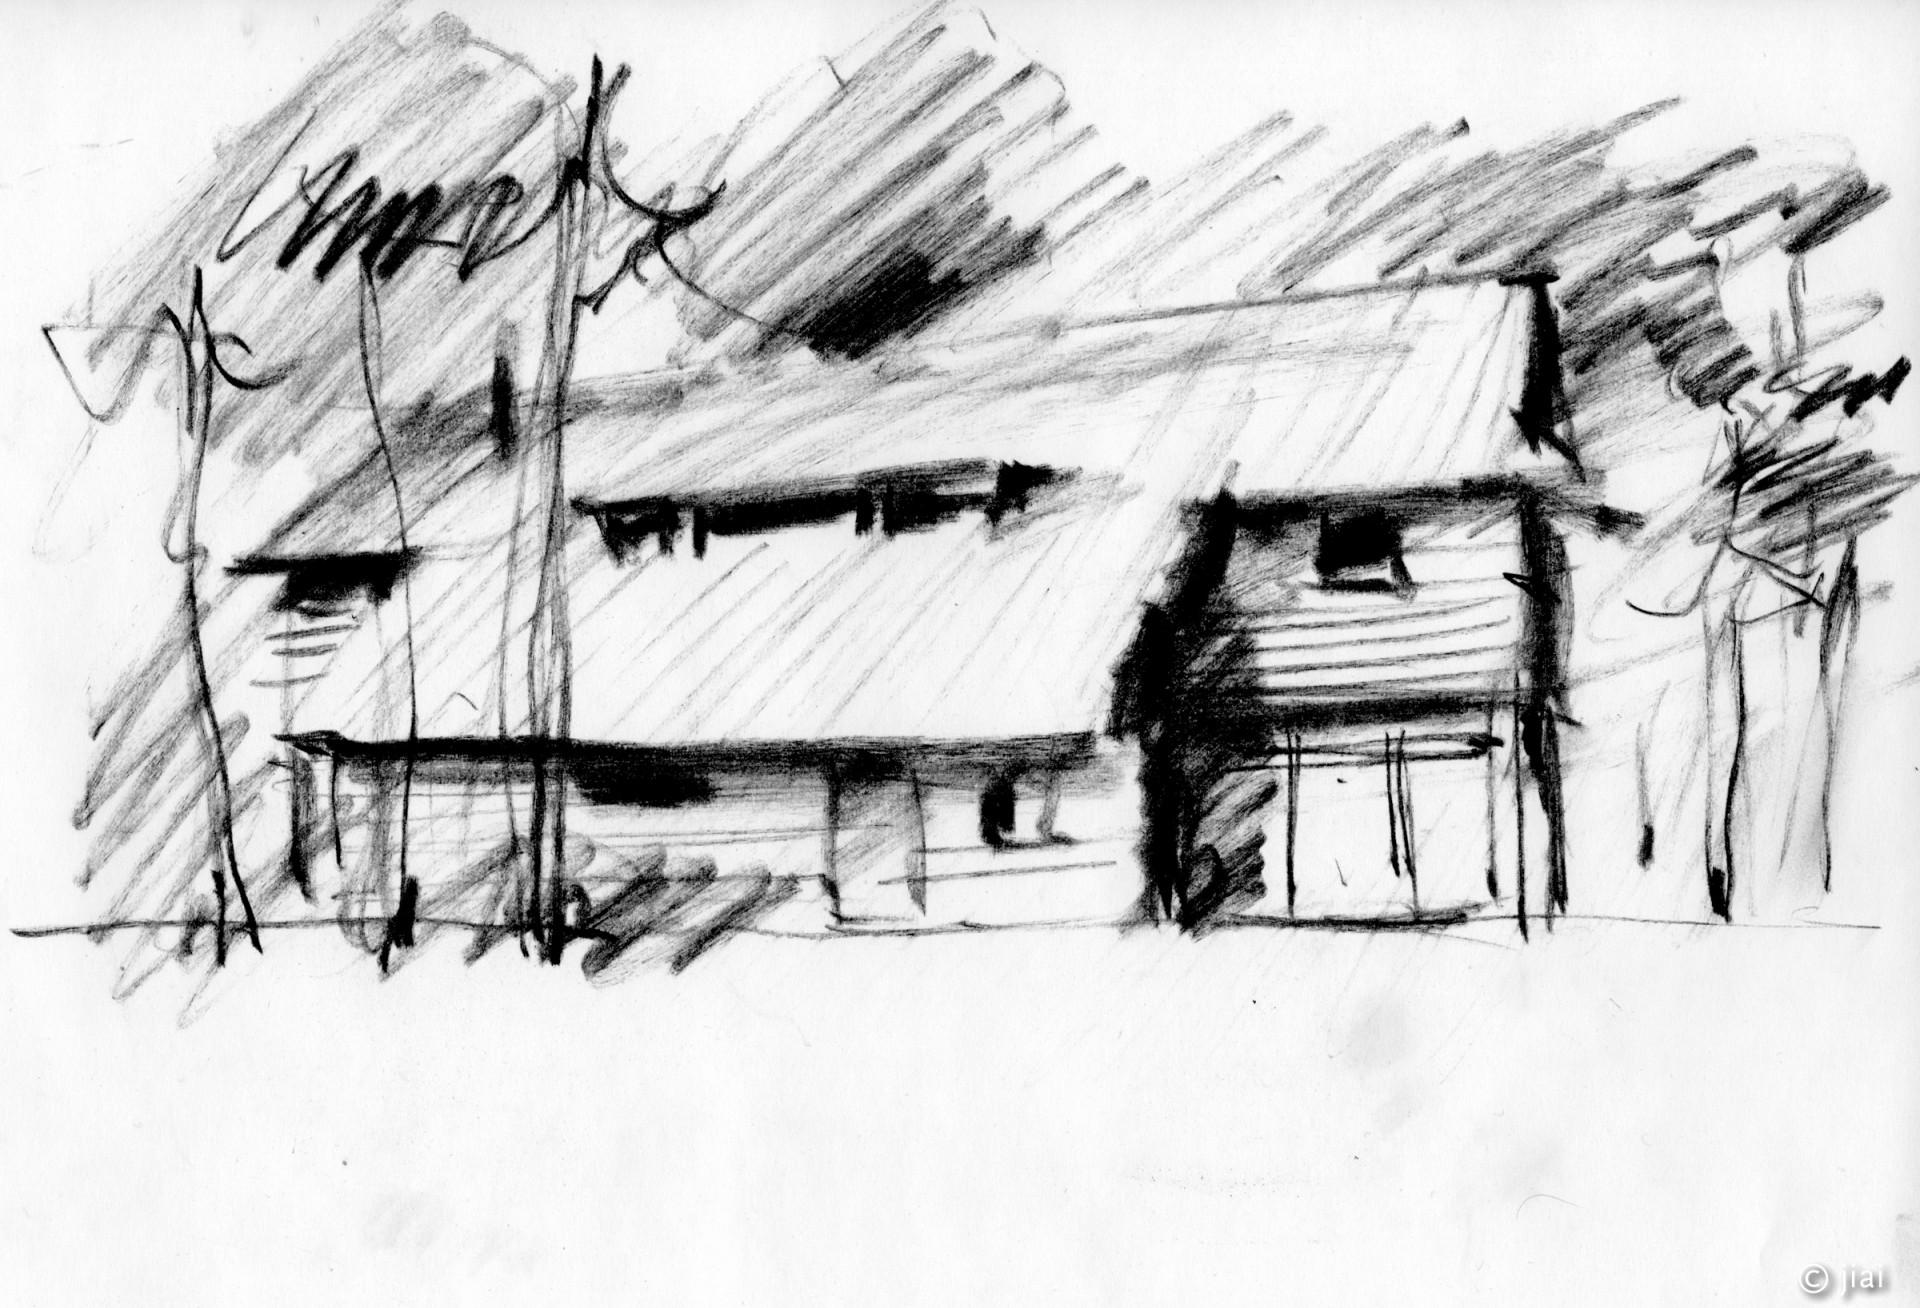 Building Schematic Design